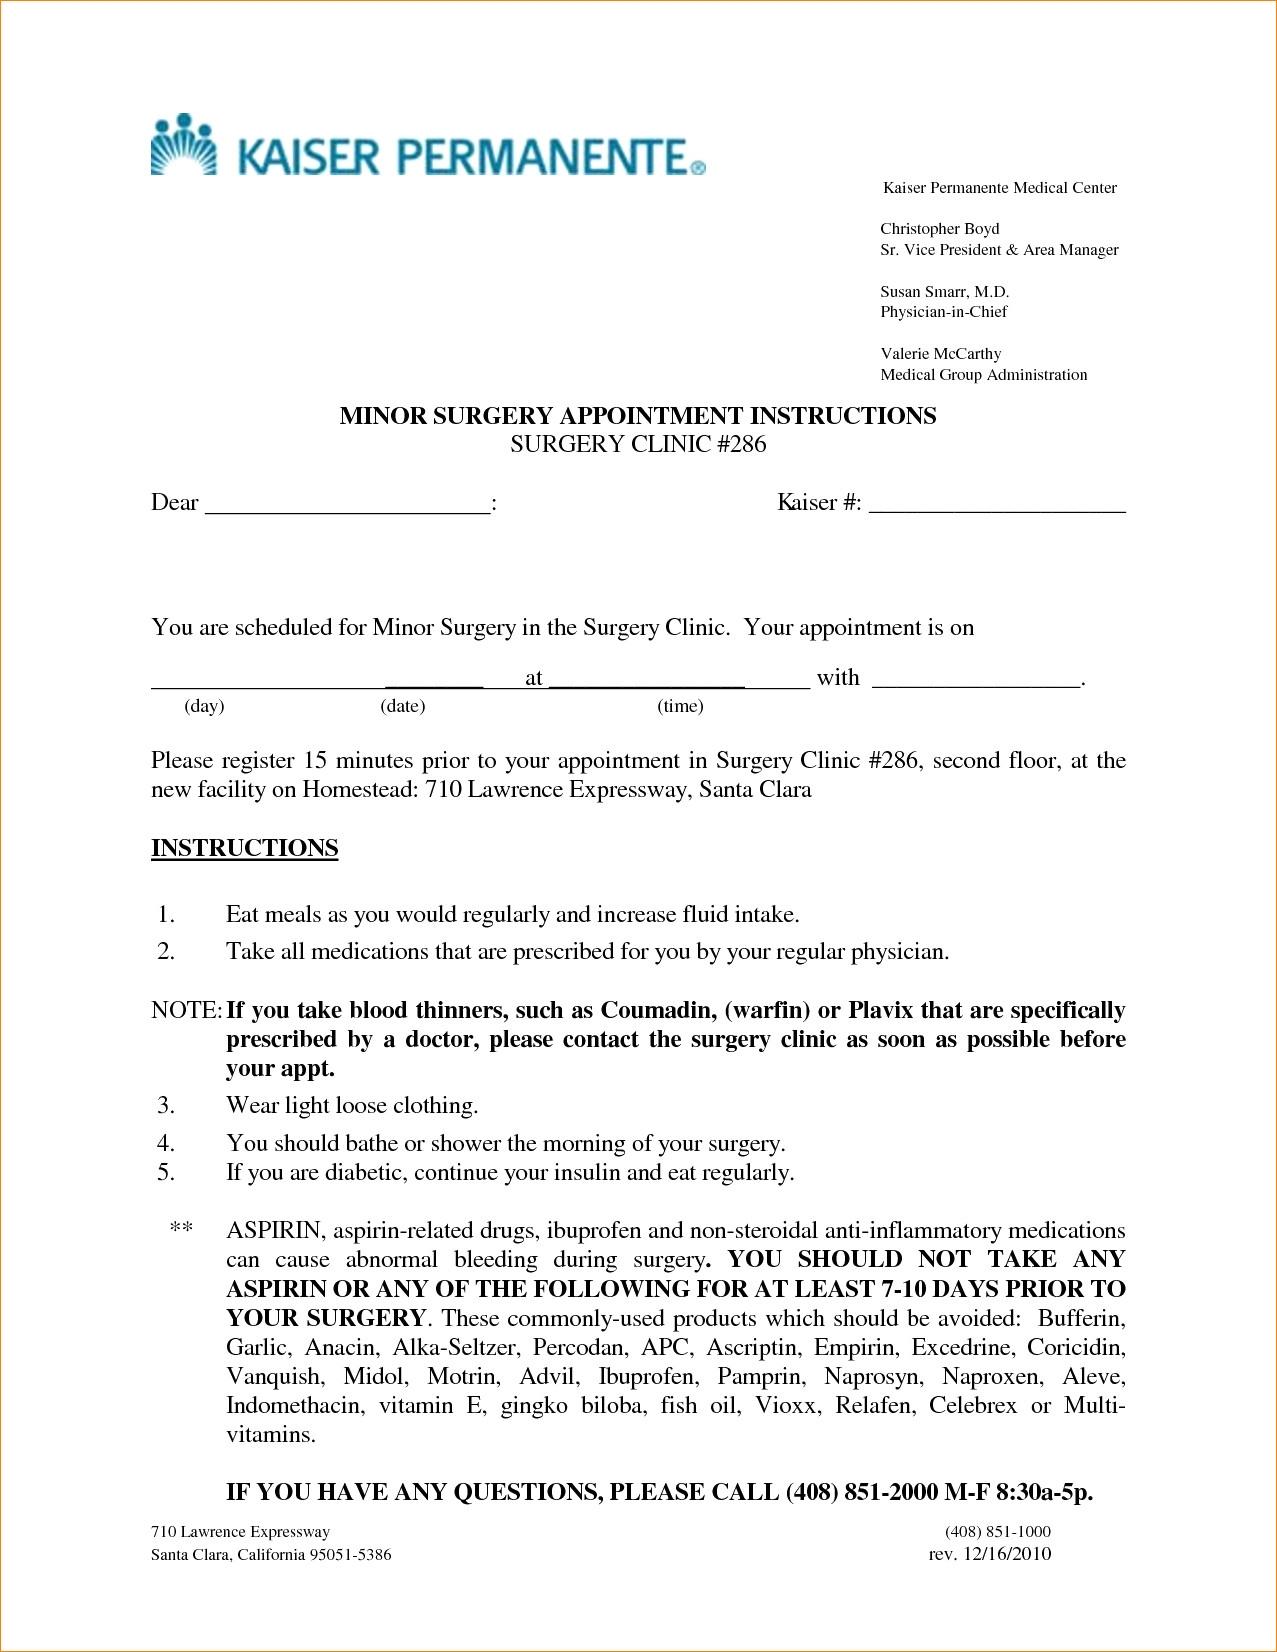 Kaiser Permanente Doctors Note Pdf Free